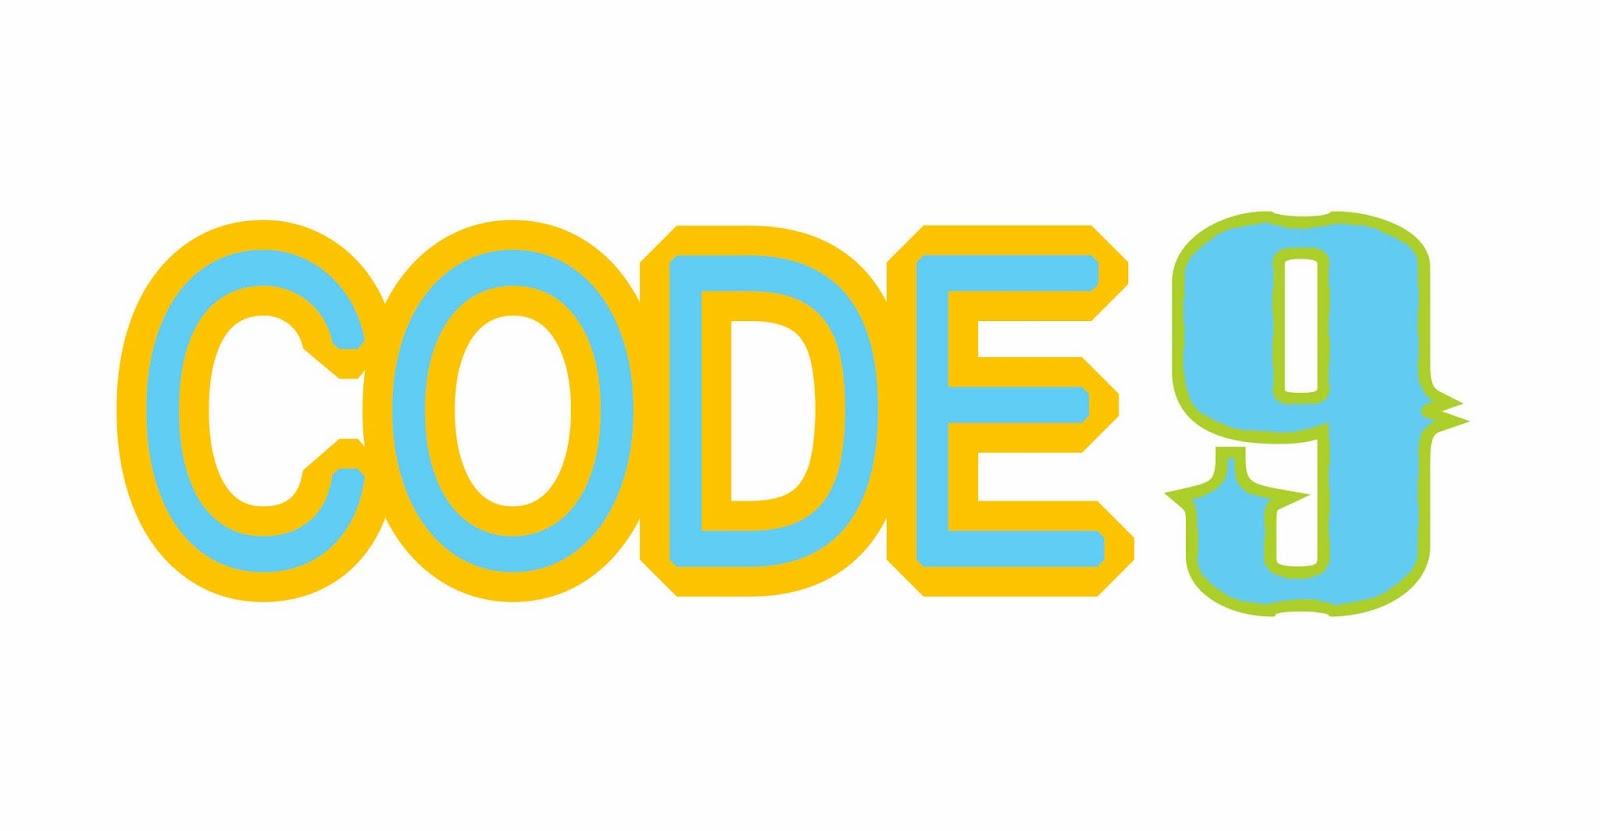 http://1.bp.blogspot.com/-f30g_3e8f2w/UsAYIIRR5lI/AAAAAAAAAWI/-Hmh_NMkLuQ/s1600/Code+9+Logo.jpg